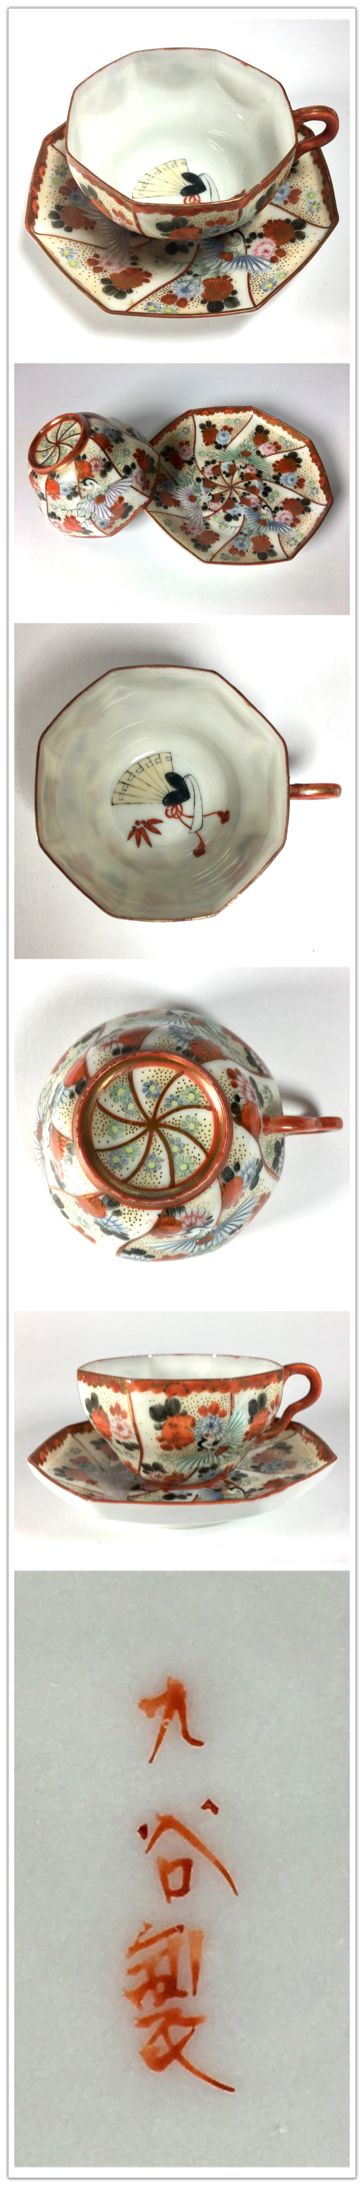 Japanese Kutani cup and saucer from the Meiji period. Kutani Sei. (九谷製) Kutani made.